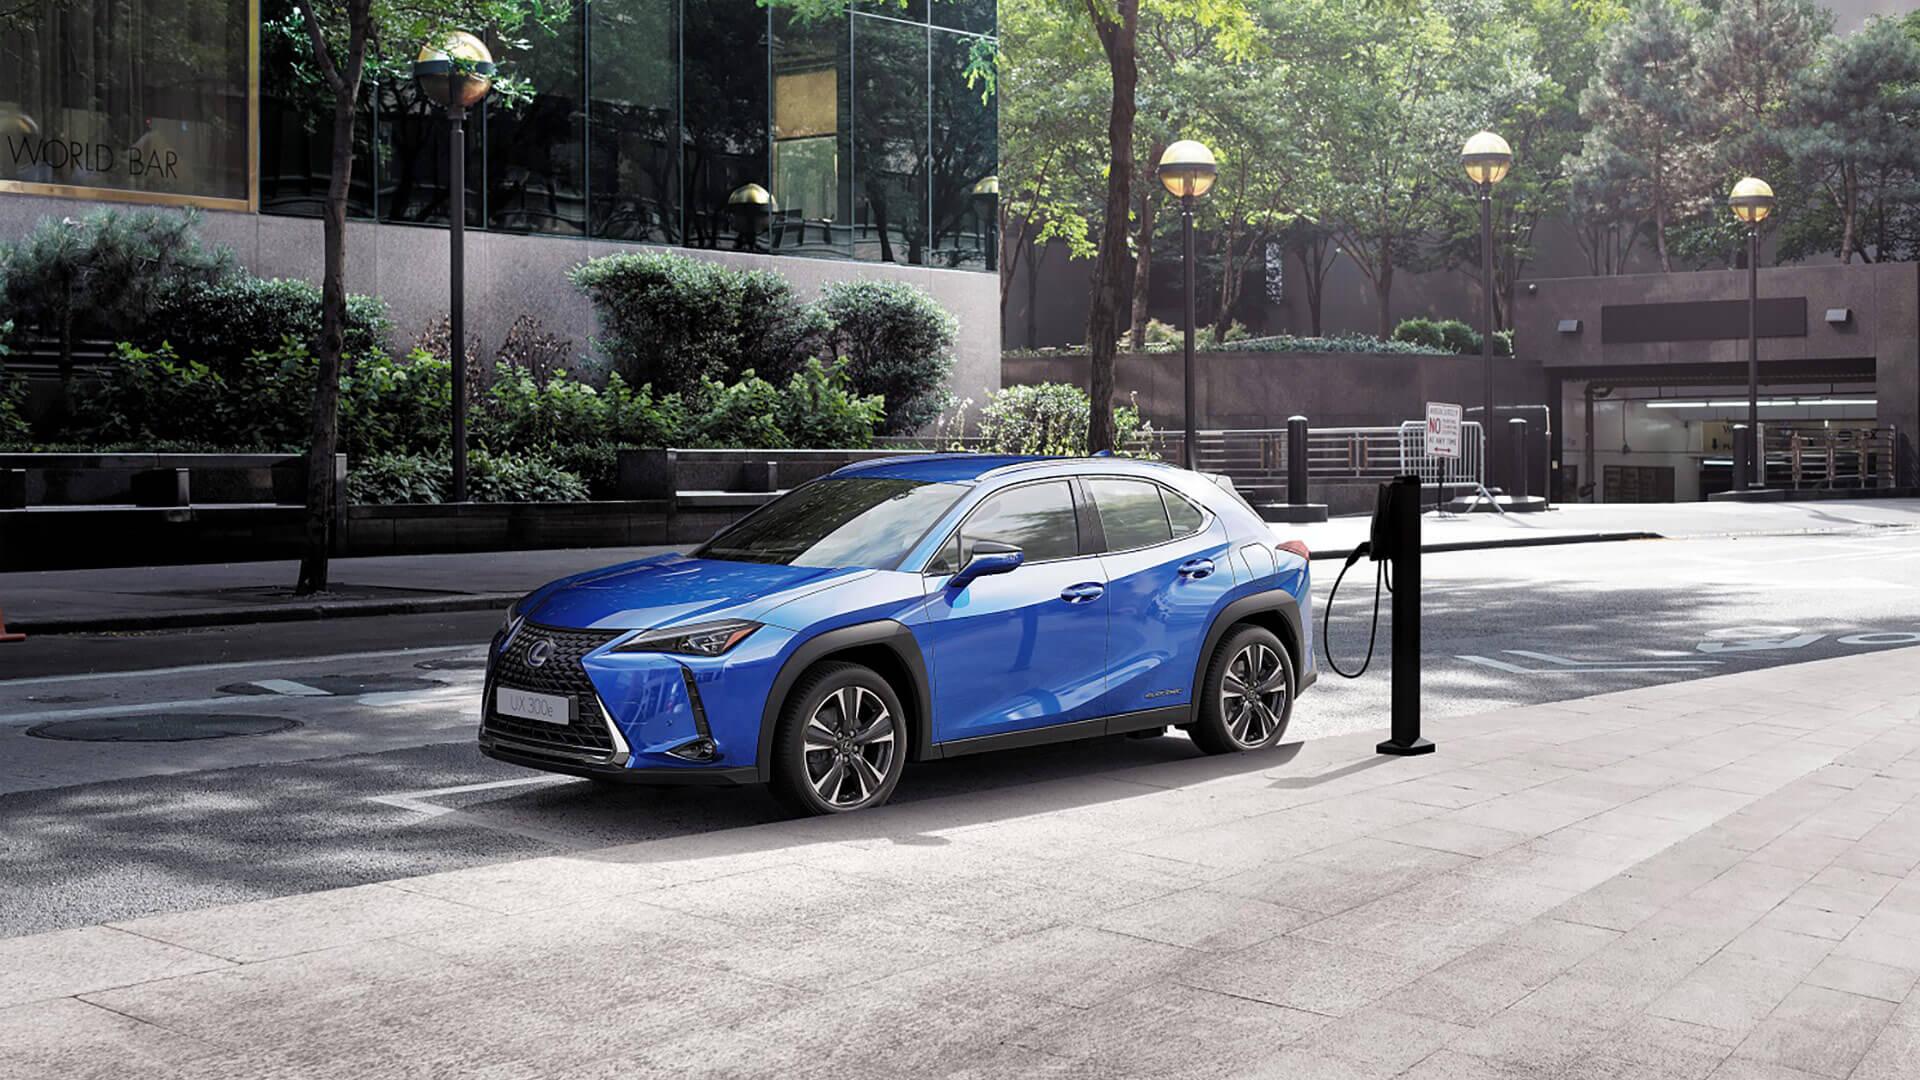 lexus elektrikli modeline 1 milyon kilometre garanti veriyor gallery02